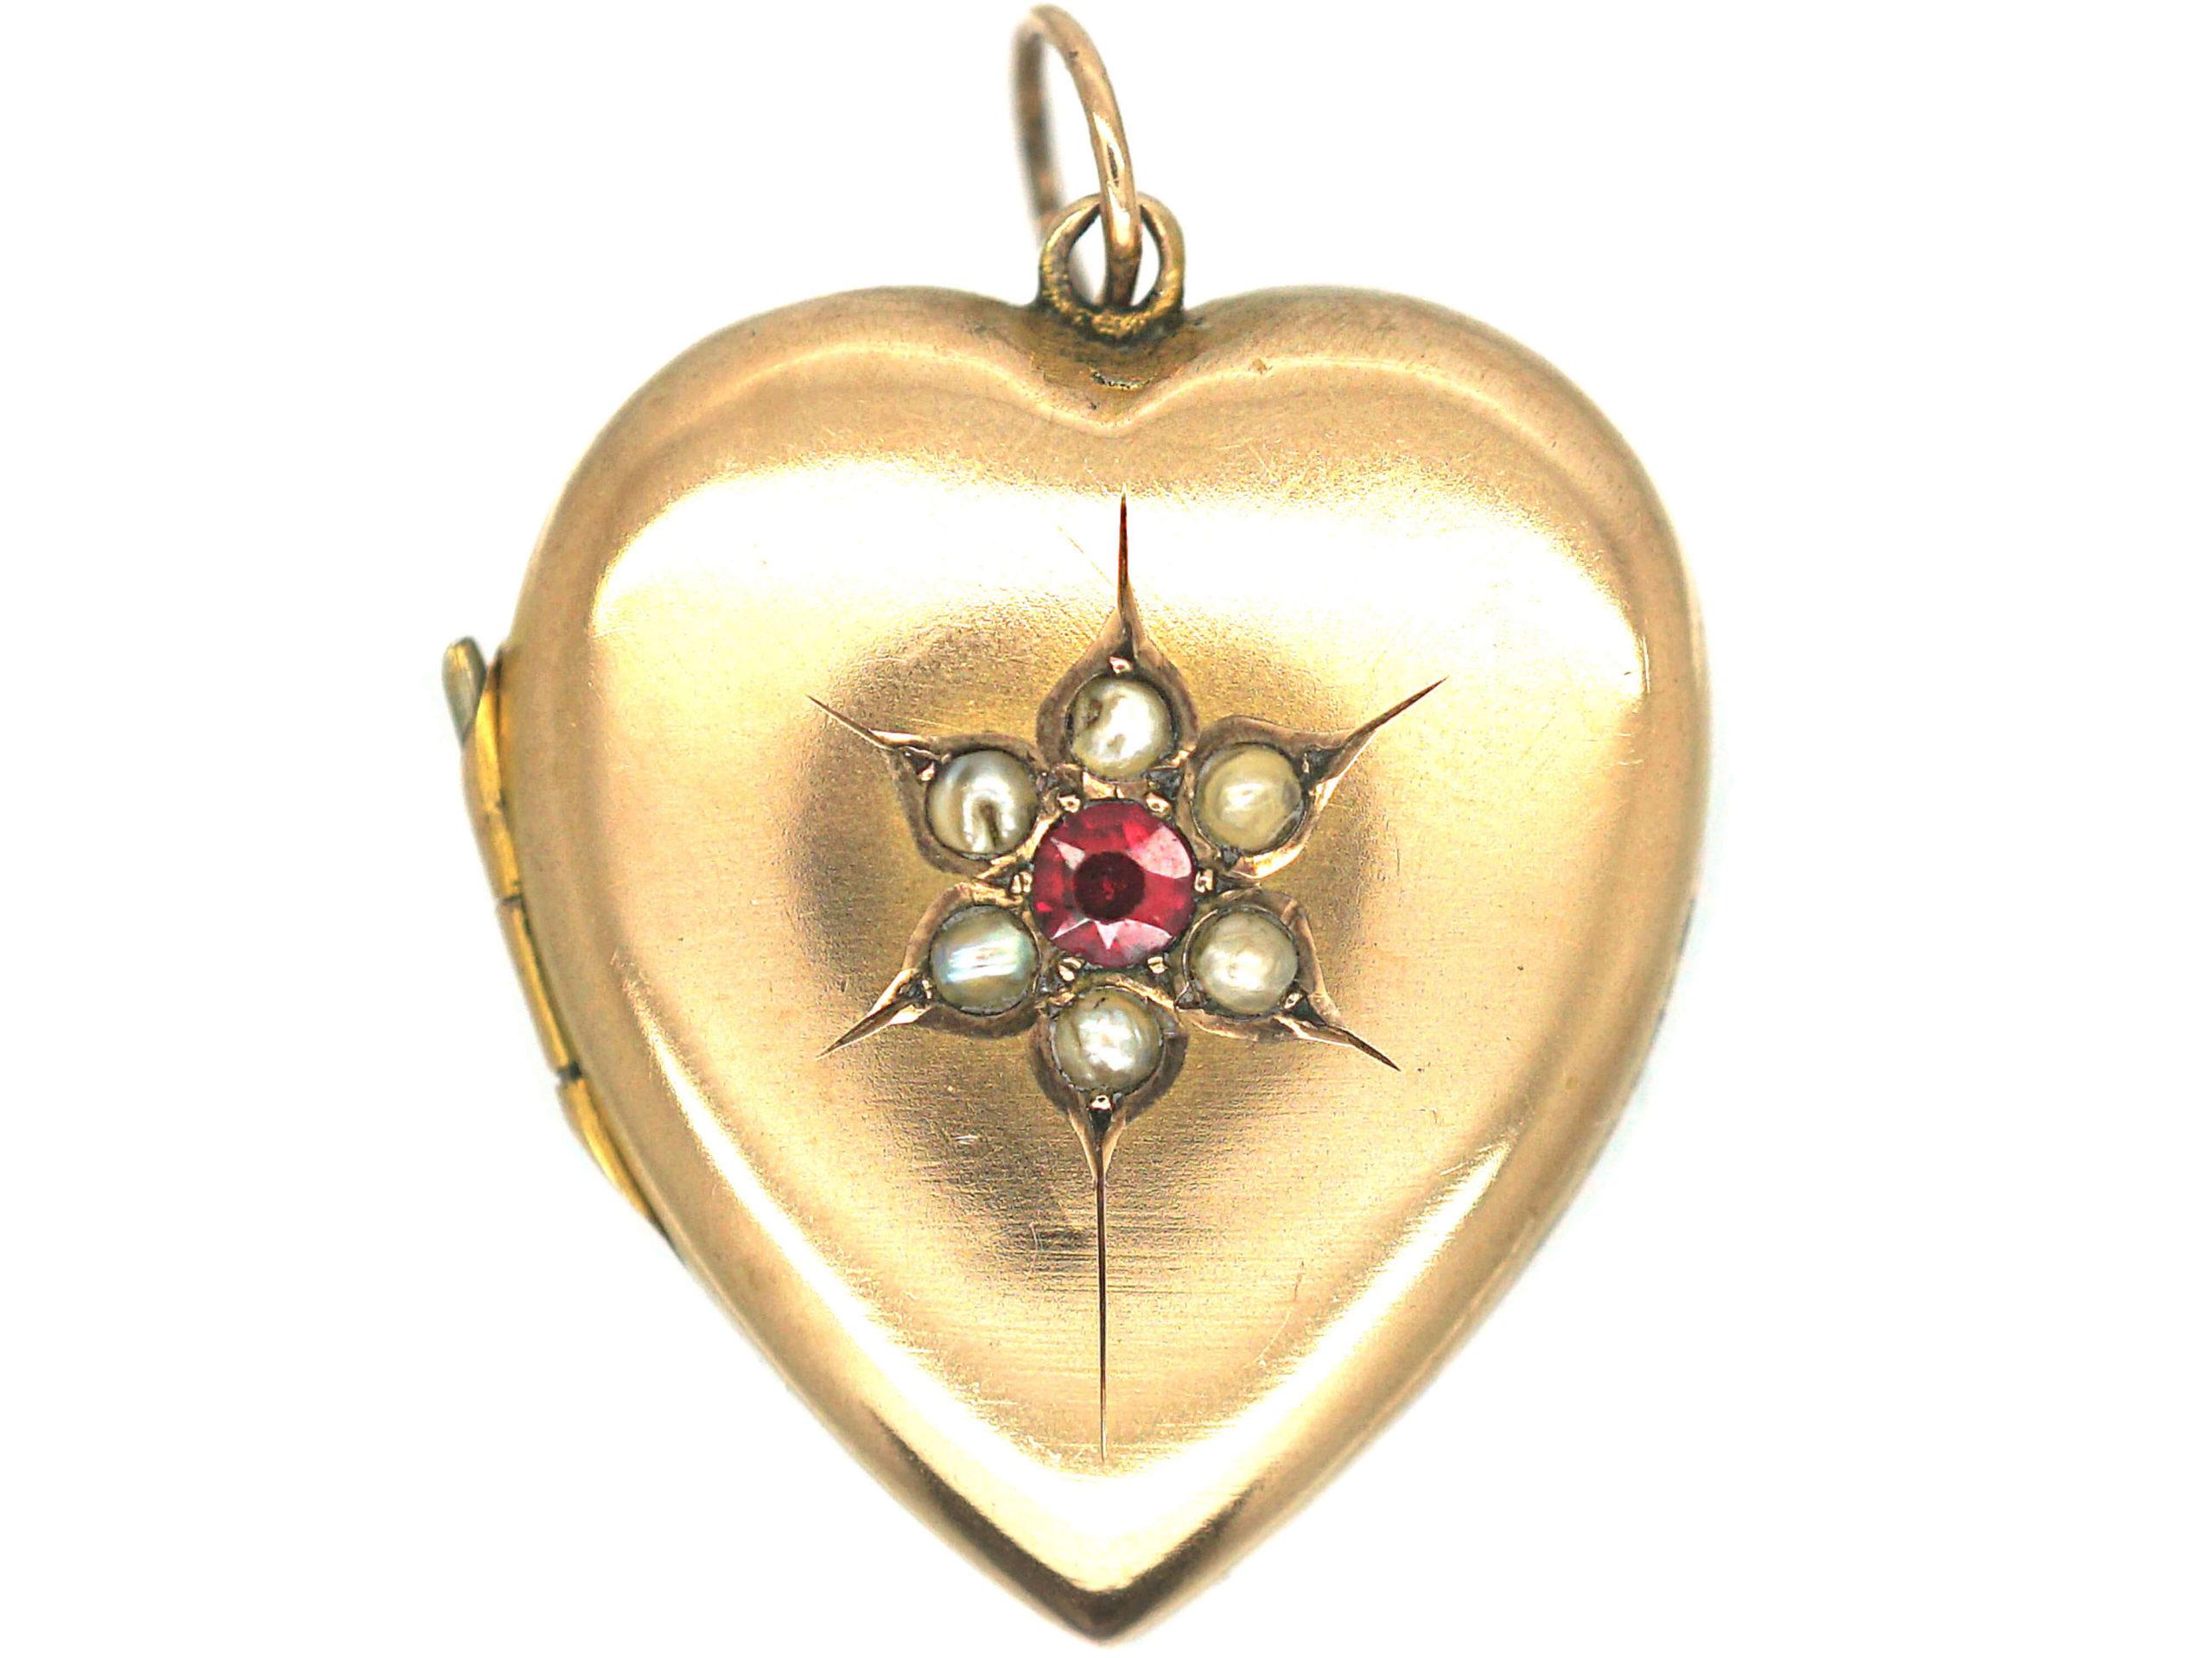 Edwardian 9ct Gold Heart Shaped Locket set with a Garnet & Natural Split Pearls